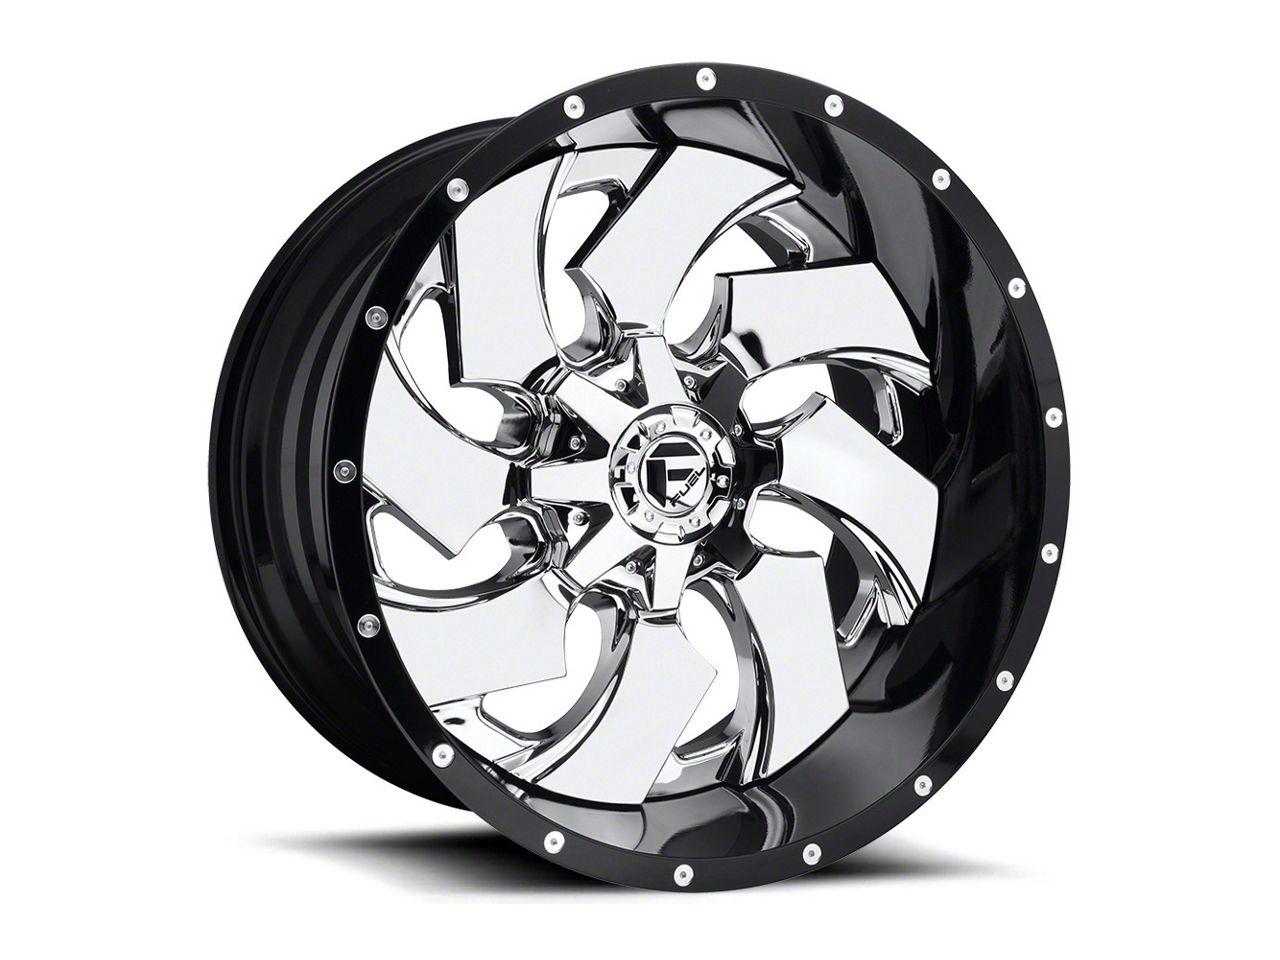 Fuel Wheels Cleaver Chrome 6-Lug Wheel - 24x16 (07-18 Sierra 1500)